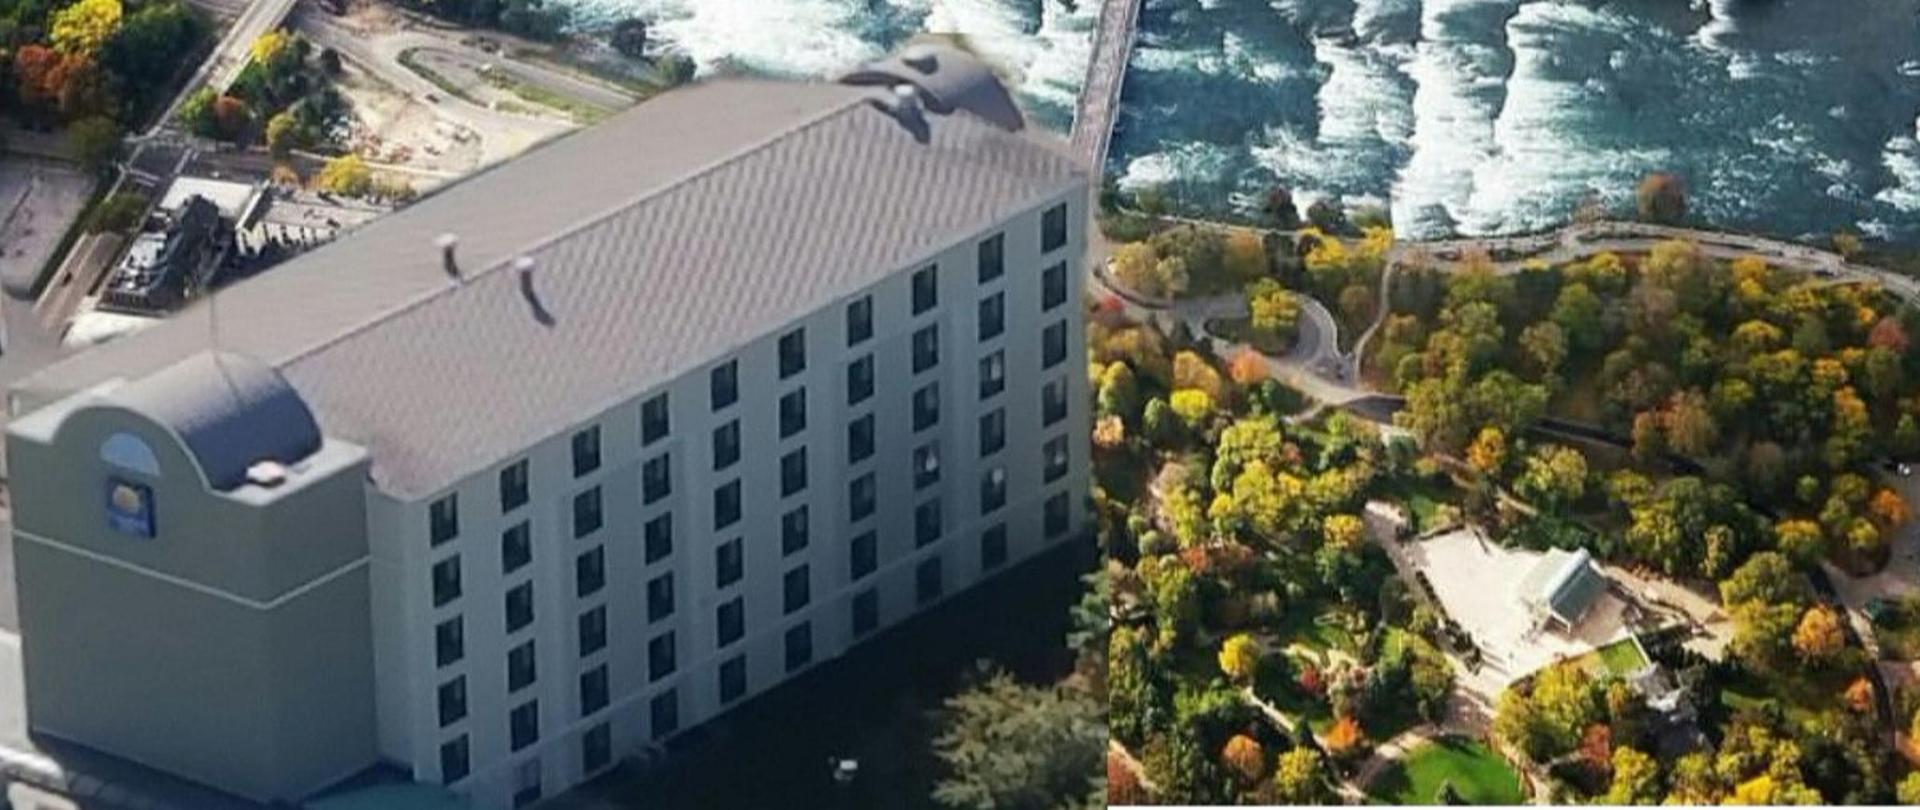 aerial-hotel-new.jpg